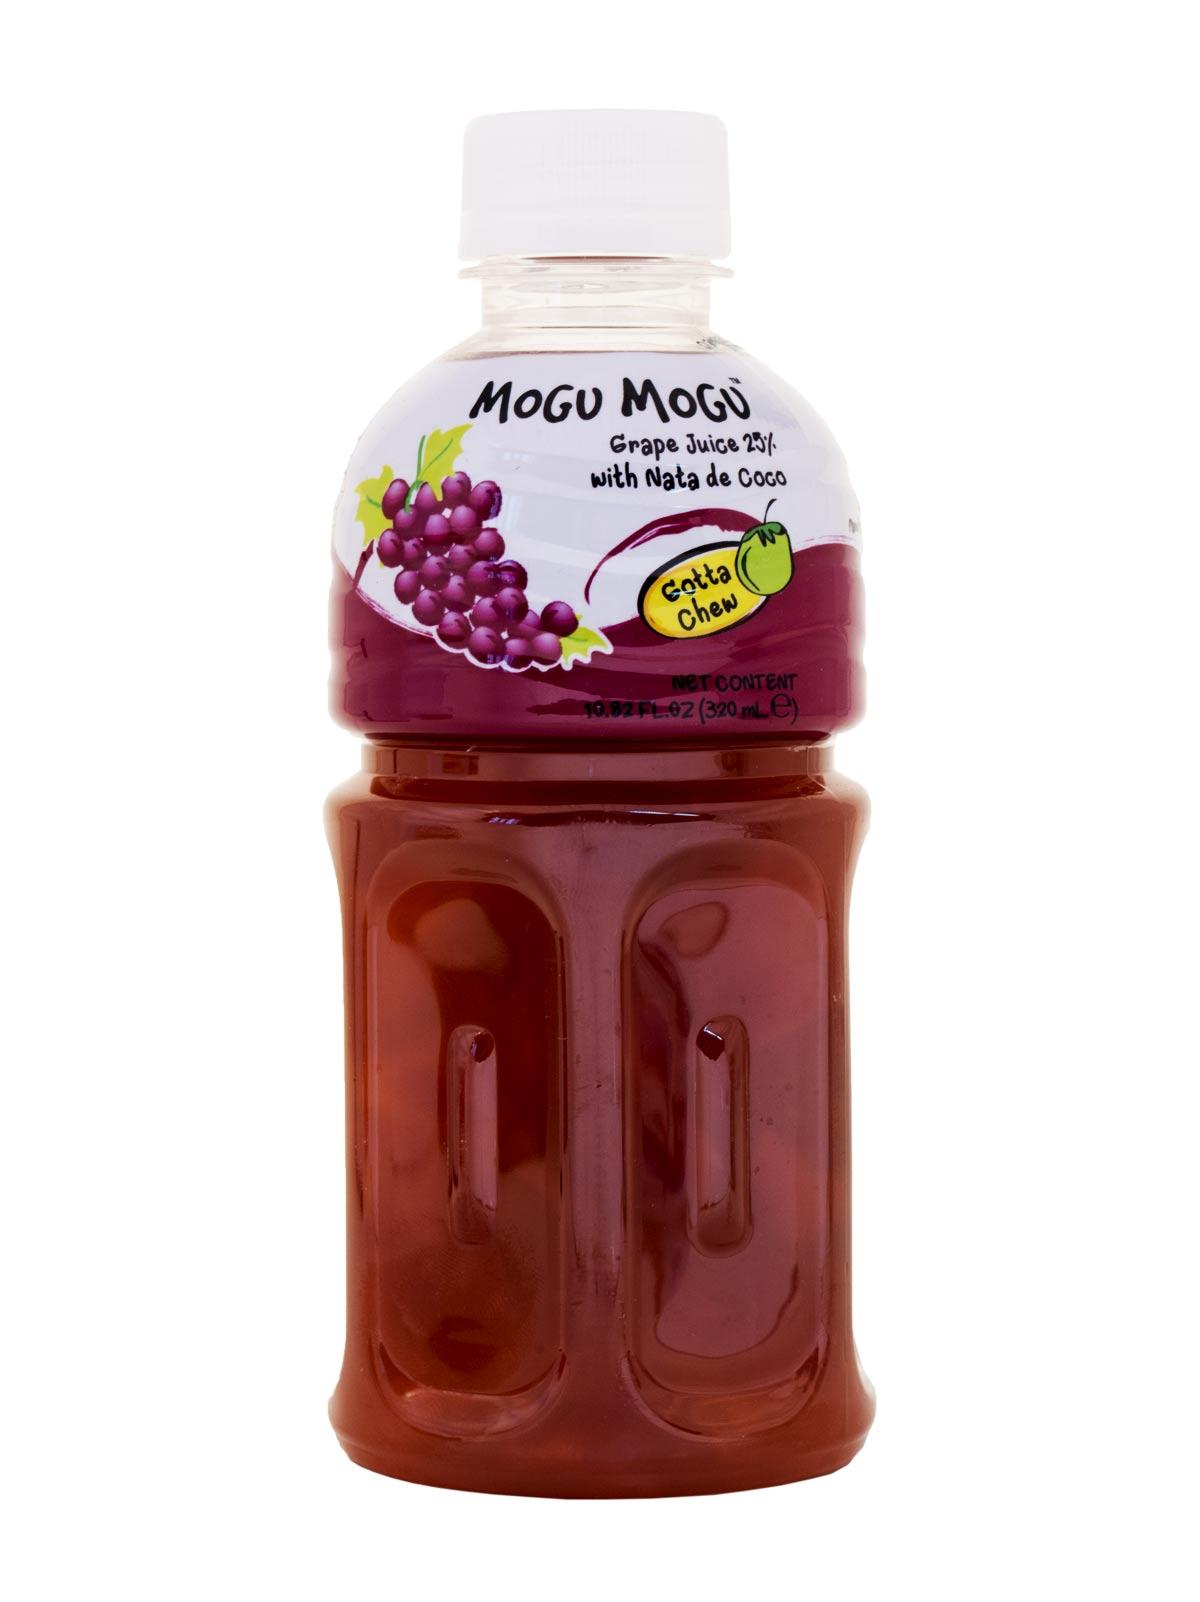 آبمیوه انگور قرمز 230MIL موگو موگو - آبمیوه انگور قرمز 230MIL موگو موگو